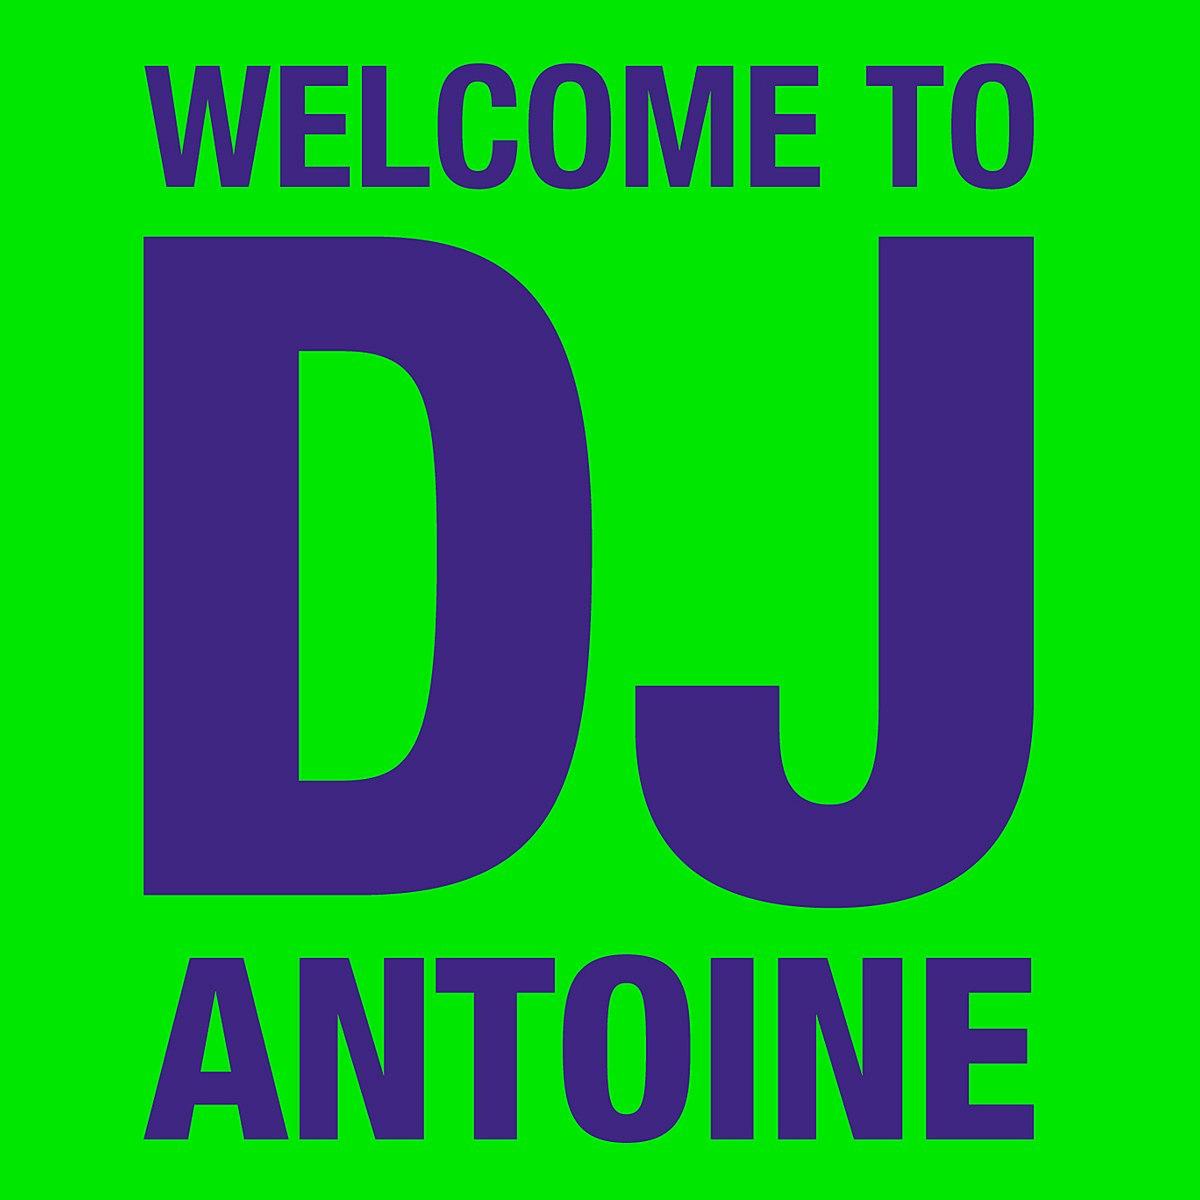 1200px-DJ_antoine_2011.jpg